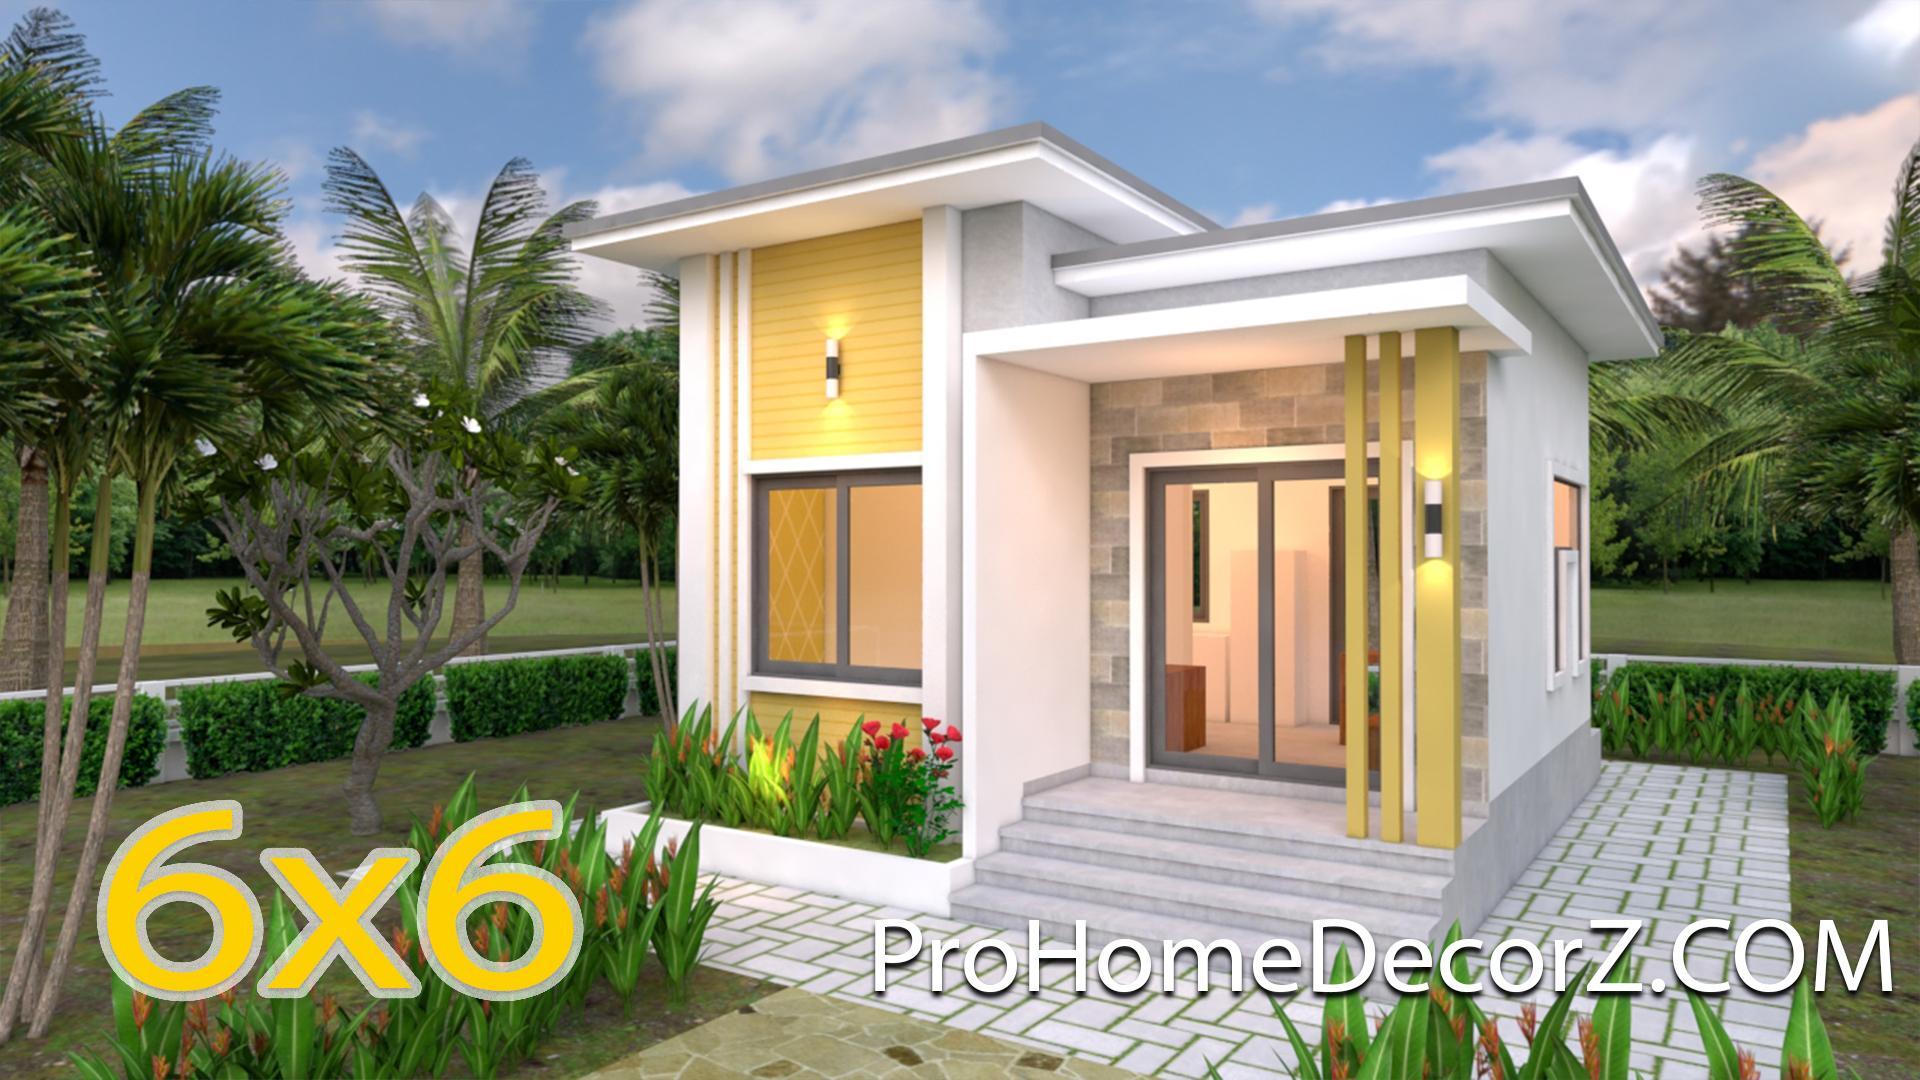 Small Modern House 32x32 Meter 32x32 Feet Flat Roof   Pro Home DecorS